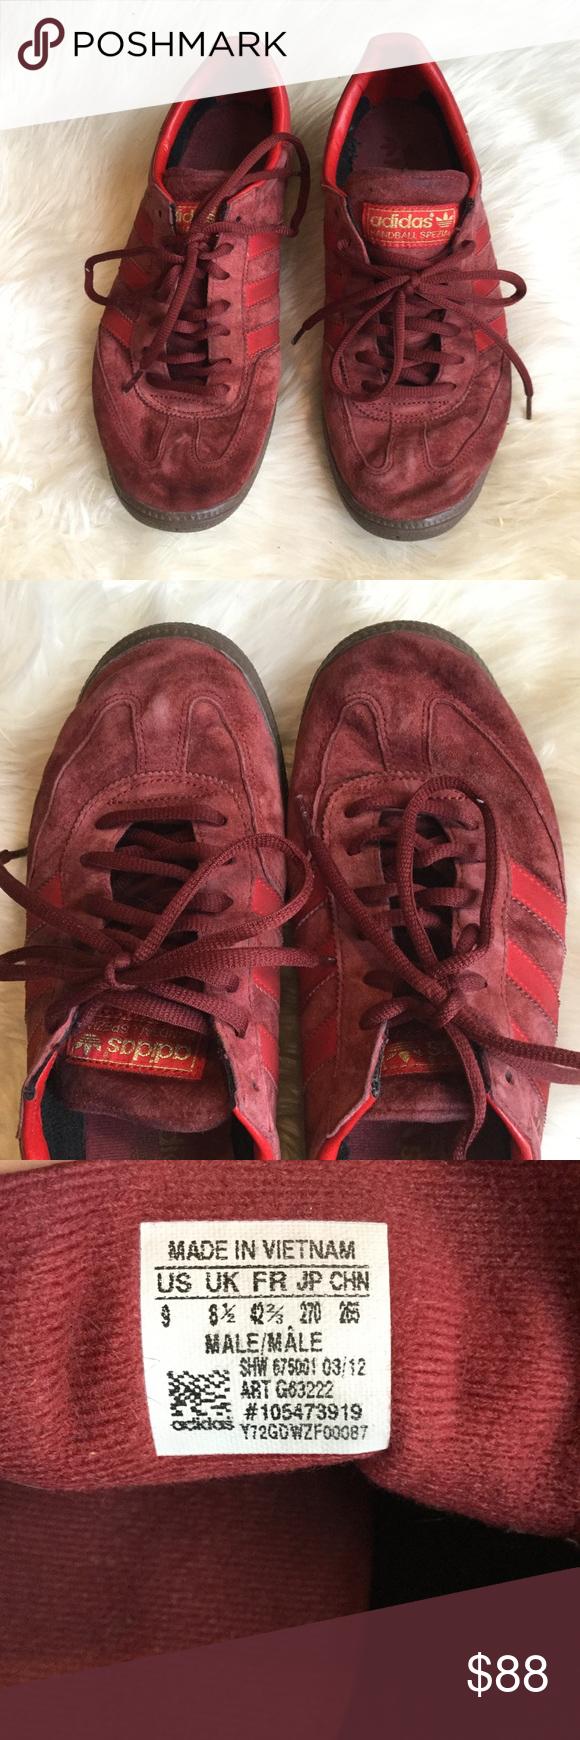 Adidas Spezial Mars Red Handball